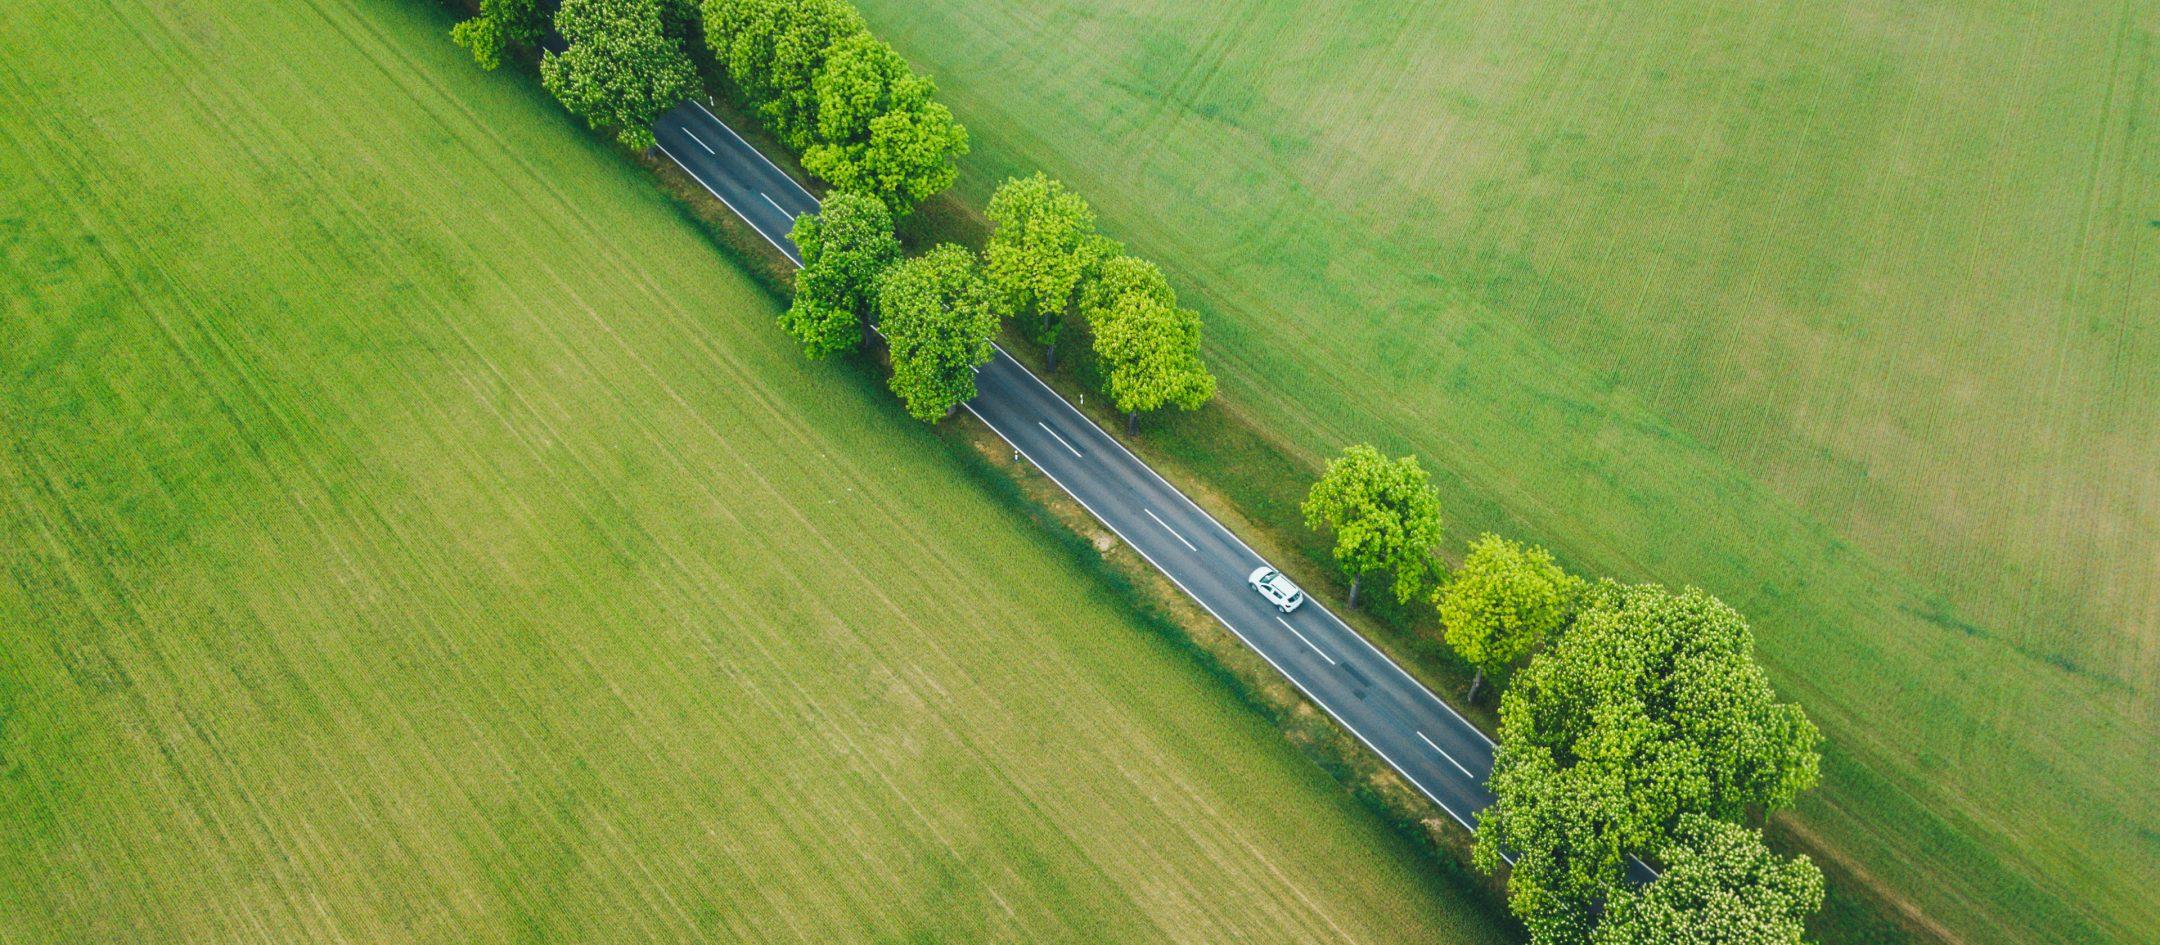 autostrom-e-mobilitaet-stromtarife-uezw-energie-3840x1730